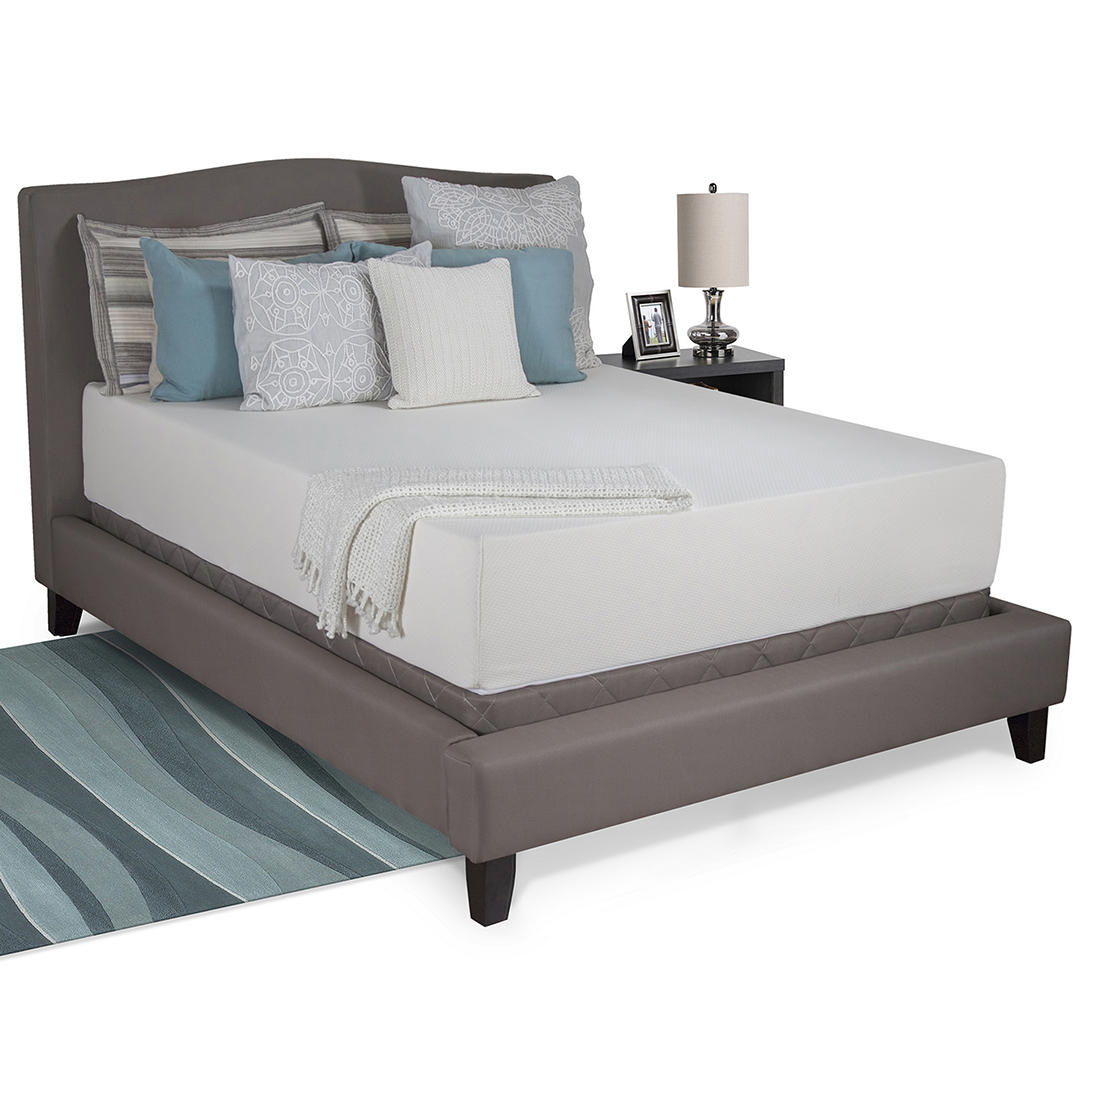 BFK Foam Mattress Cold Foam Mattress Mattress Cot Bed Mattress 7 Sizes